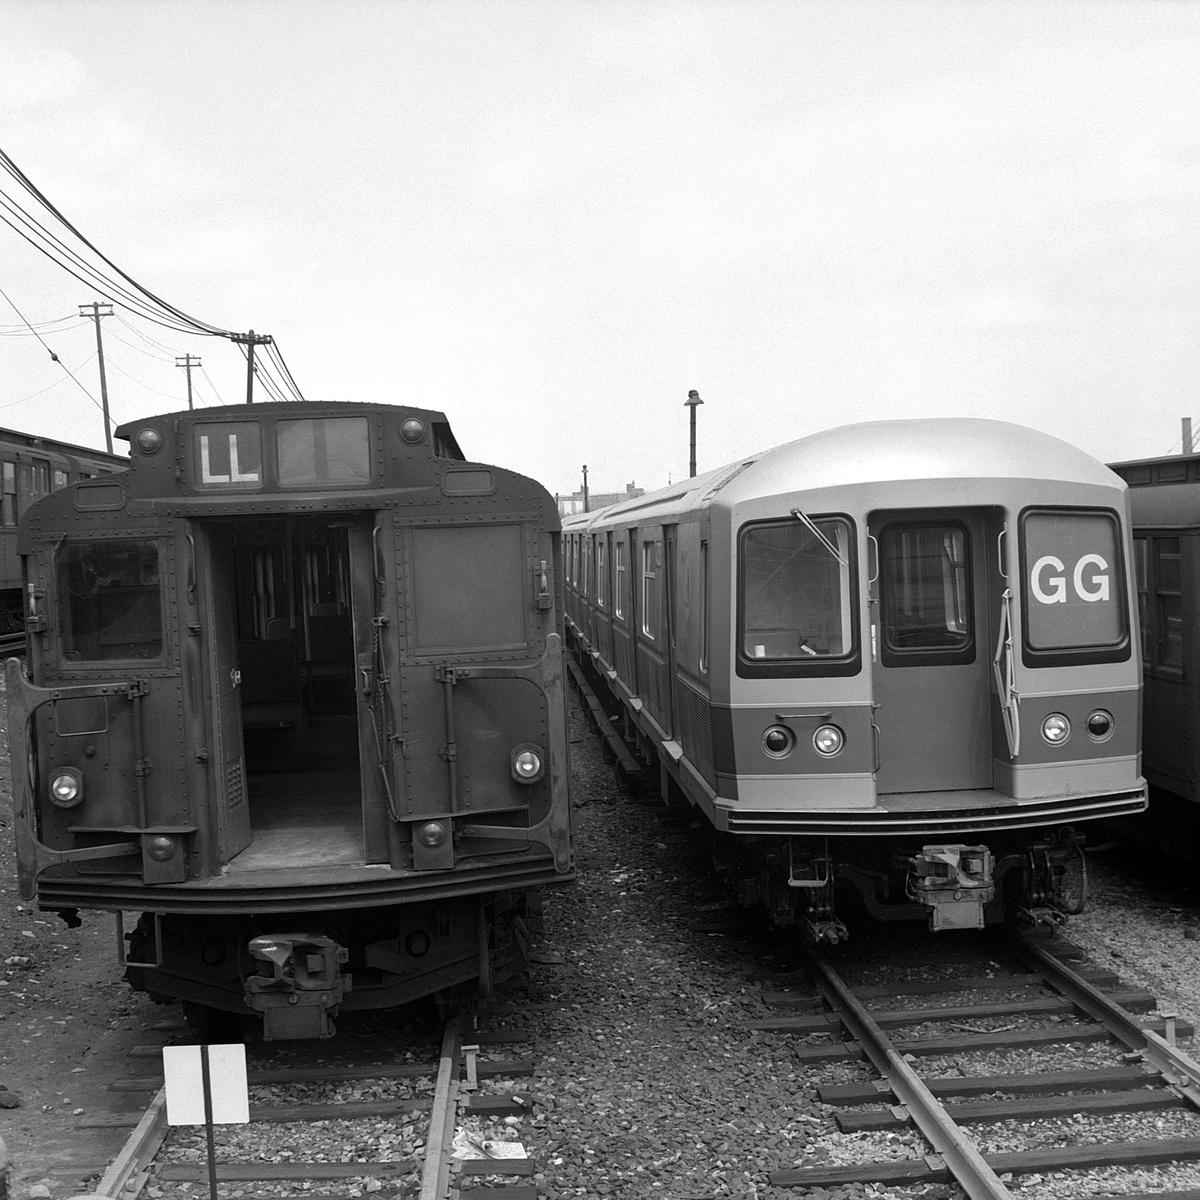 (511k, 1200x1200)<br><b>Country:</b> United States<br><b>City:</b> New York<br><b>System:</b> New York City Transit<br><b>Location:</b> Rockaway Parkway (Canarsie) Yard<br><b>Car:</b> R-1/R-9 Series  <br><b>Collection of:</b> David Pirmann<br><b>Date:</b> 4/6/1968<br><b>Viewed (this week/total):</b> 1 / 275